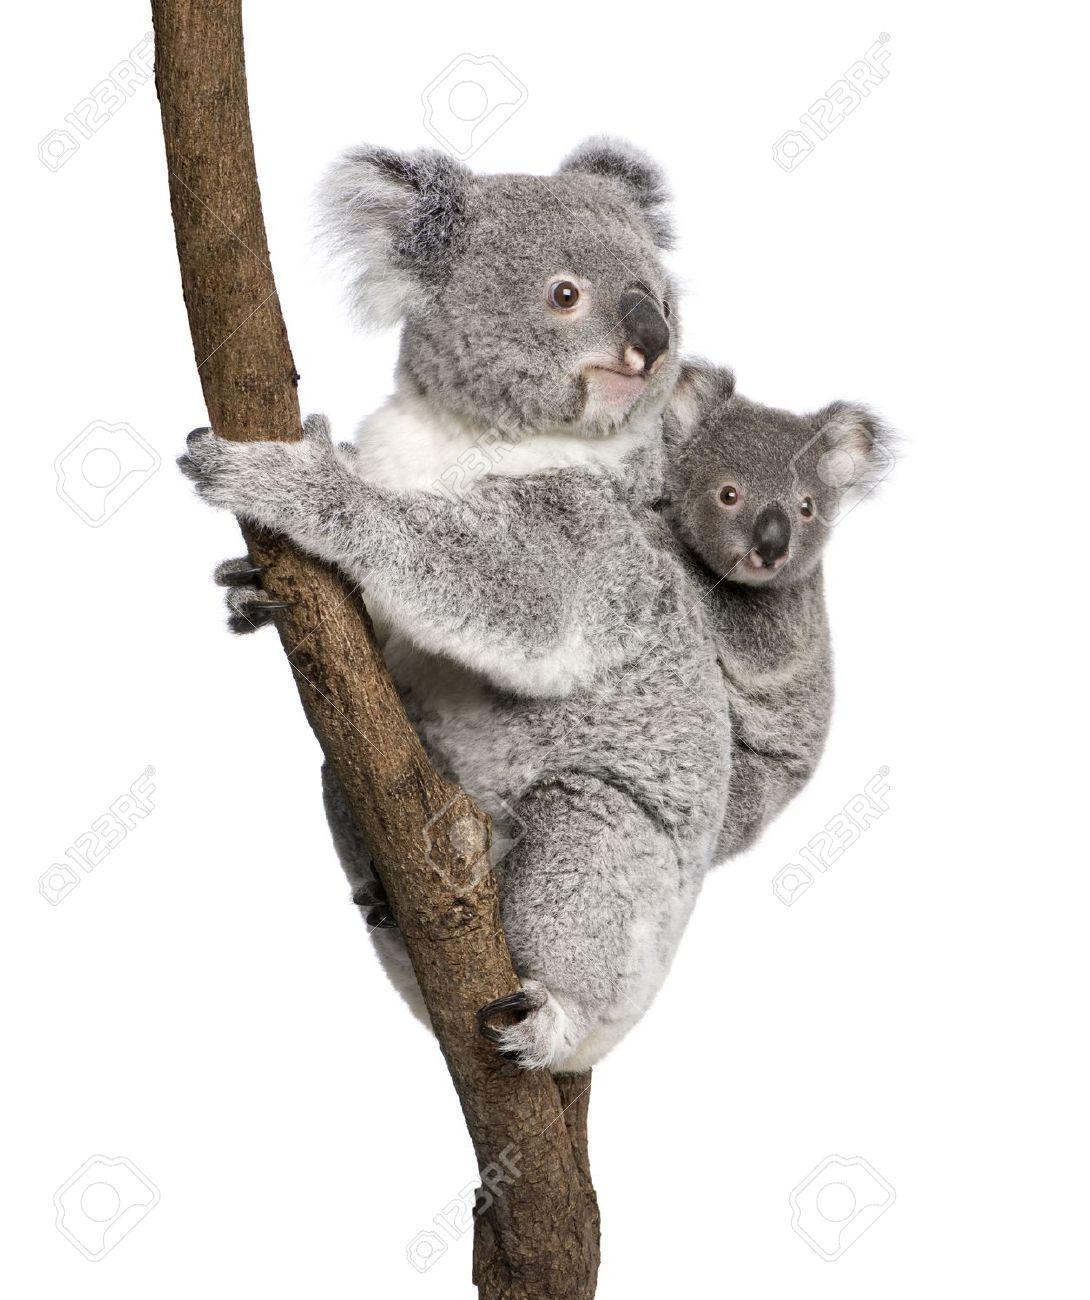 Koala bears climbing tree, 4 years old and 9 months old, Phascolarctos  cinereus, - Koala PNG HD